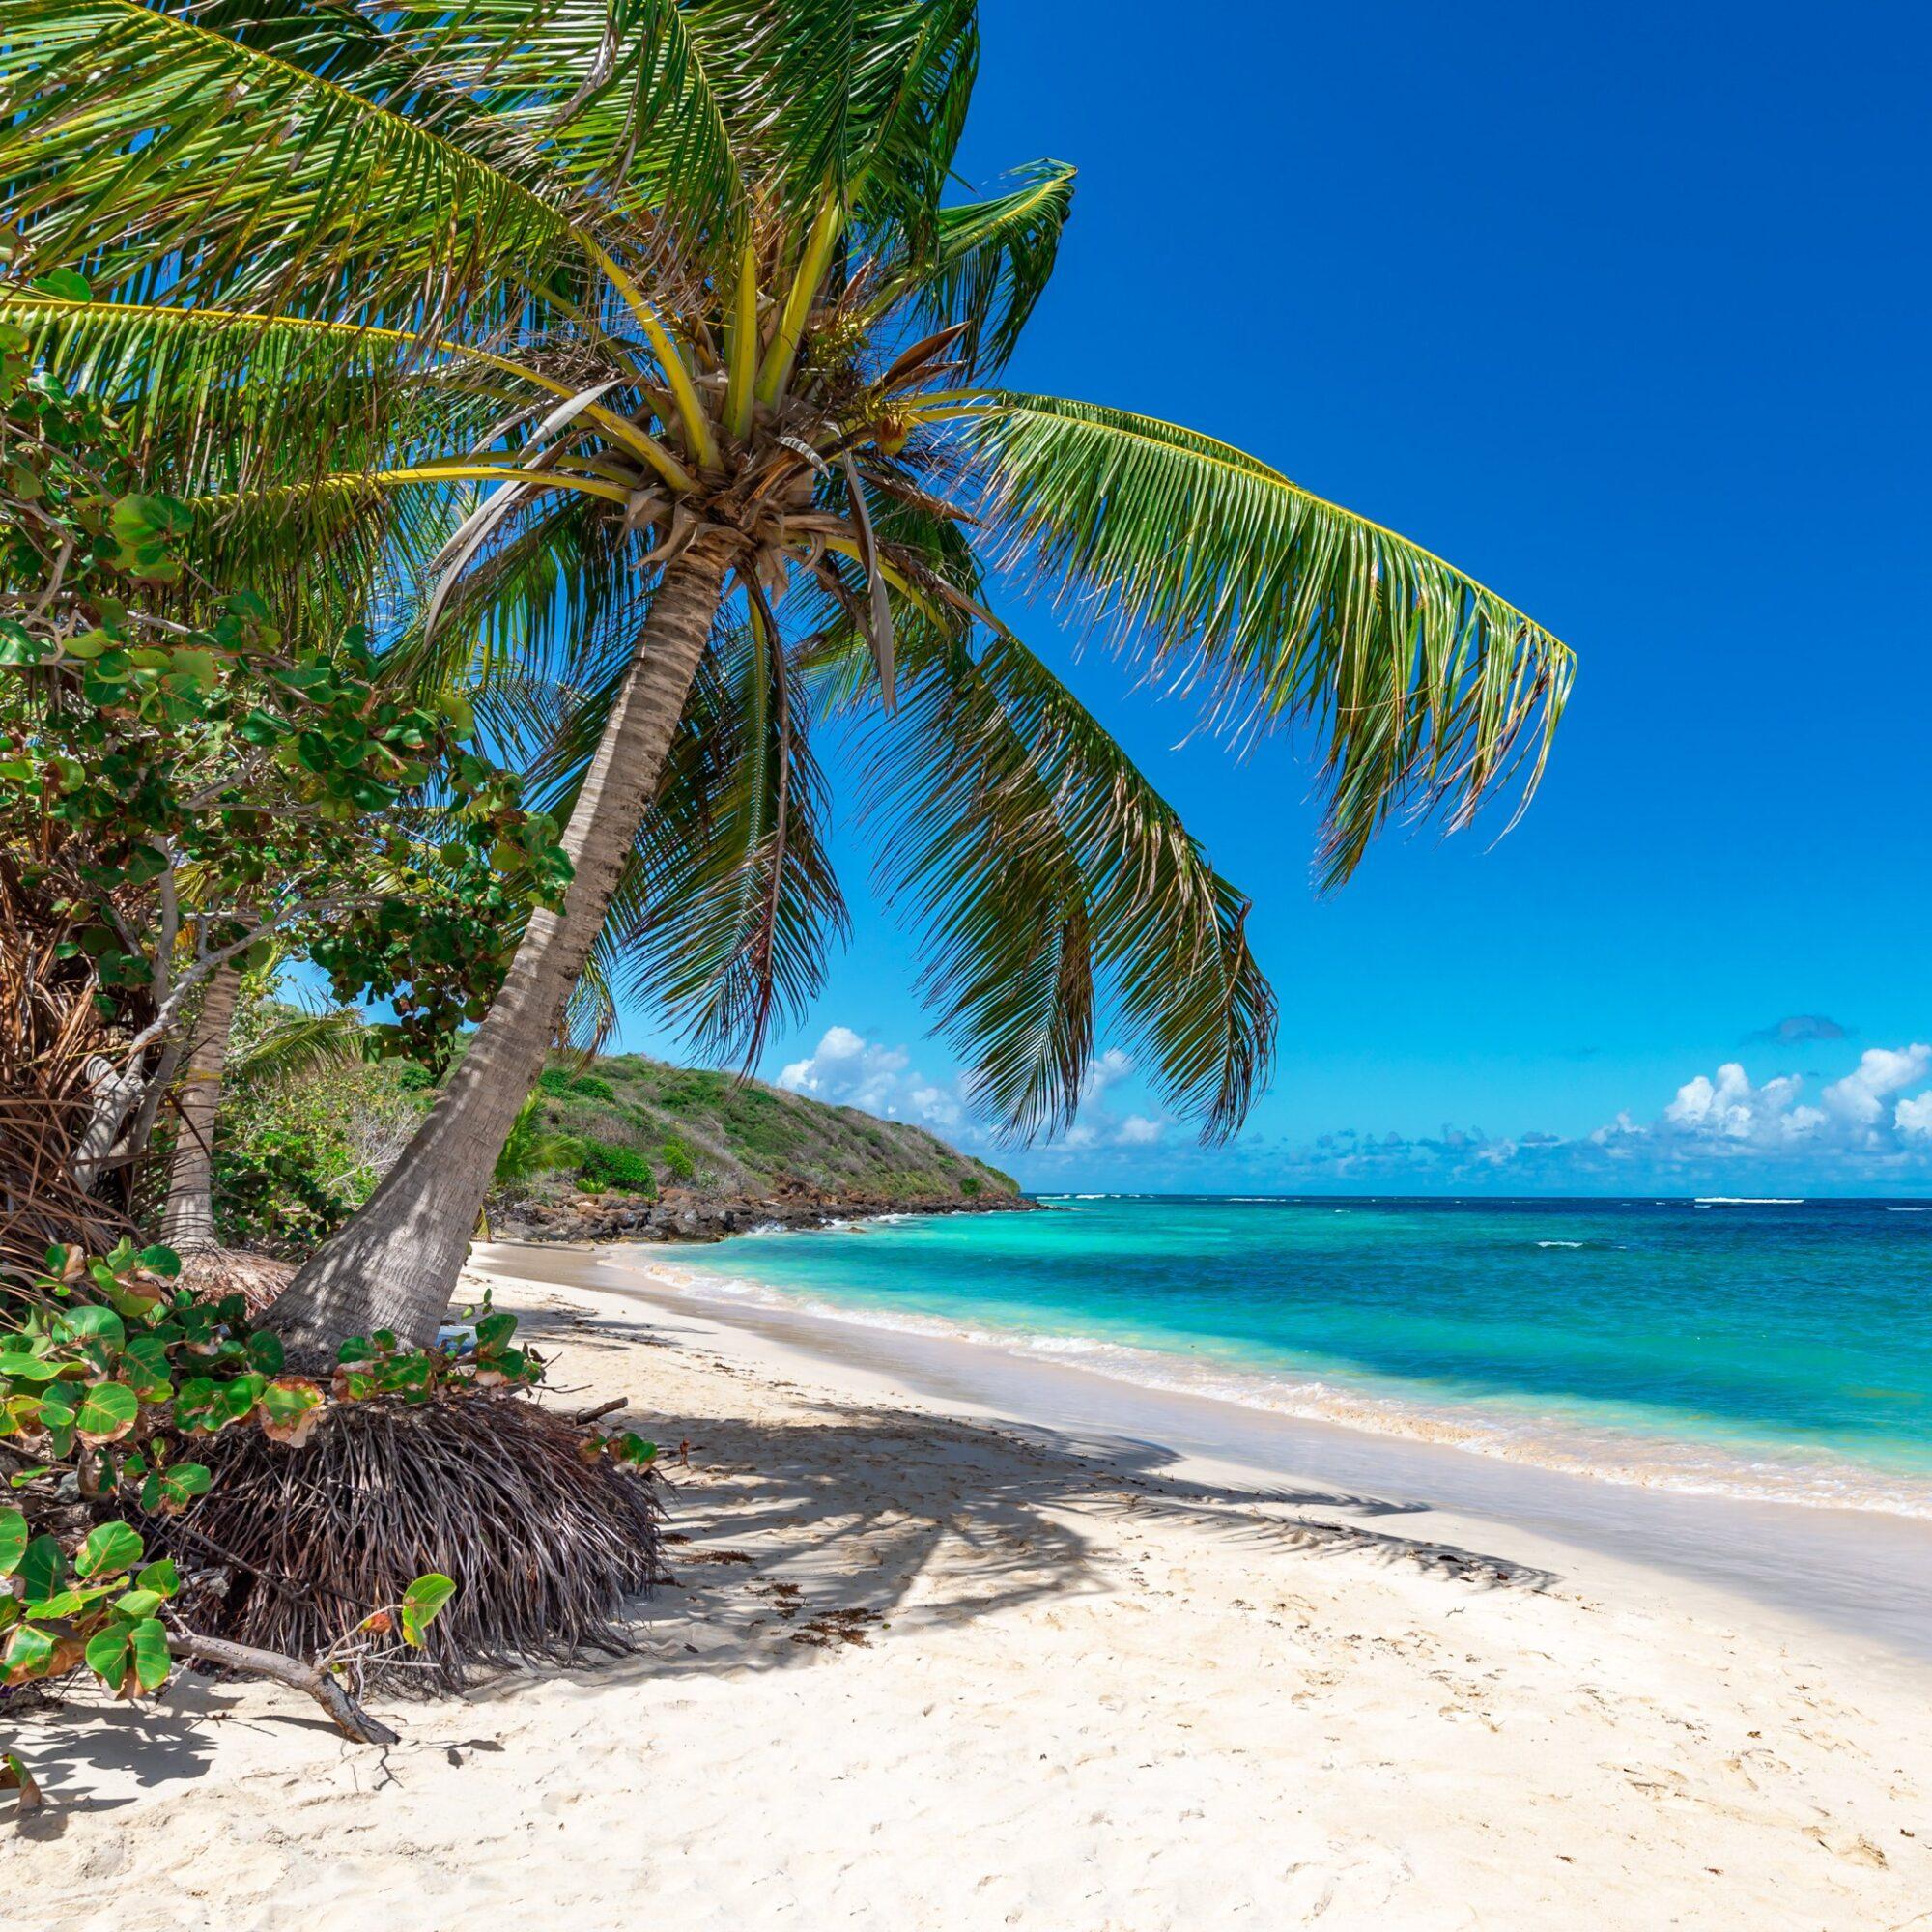 A beach in Puerto Rico.